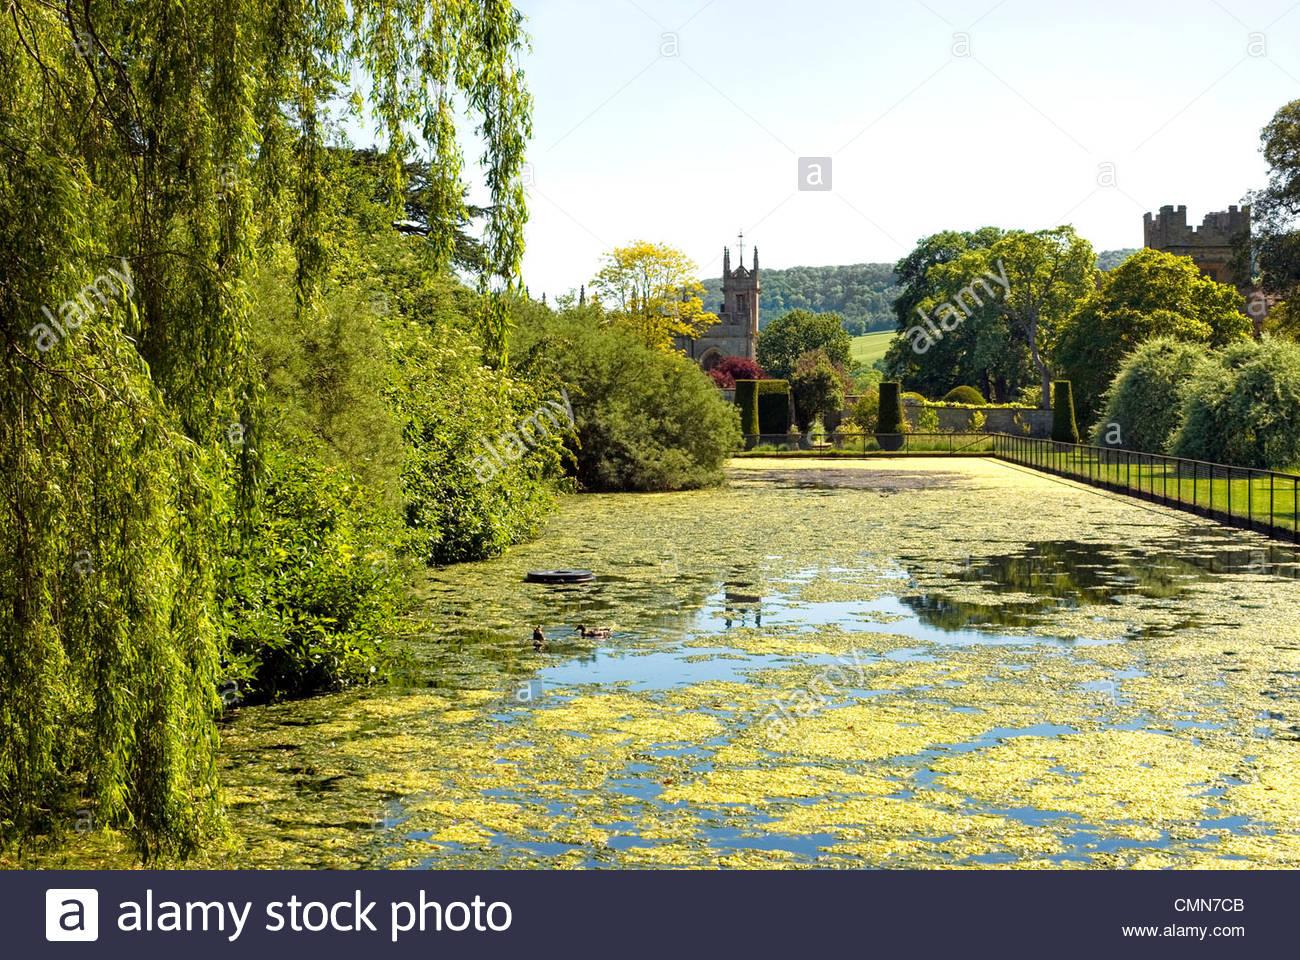 Garden at Sudeley Castle, Winchcombe, Gloucestershire, England. - Stock Image